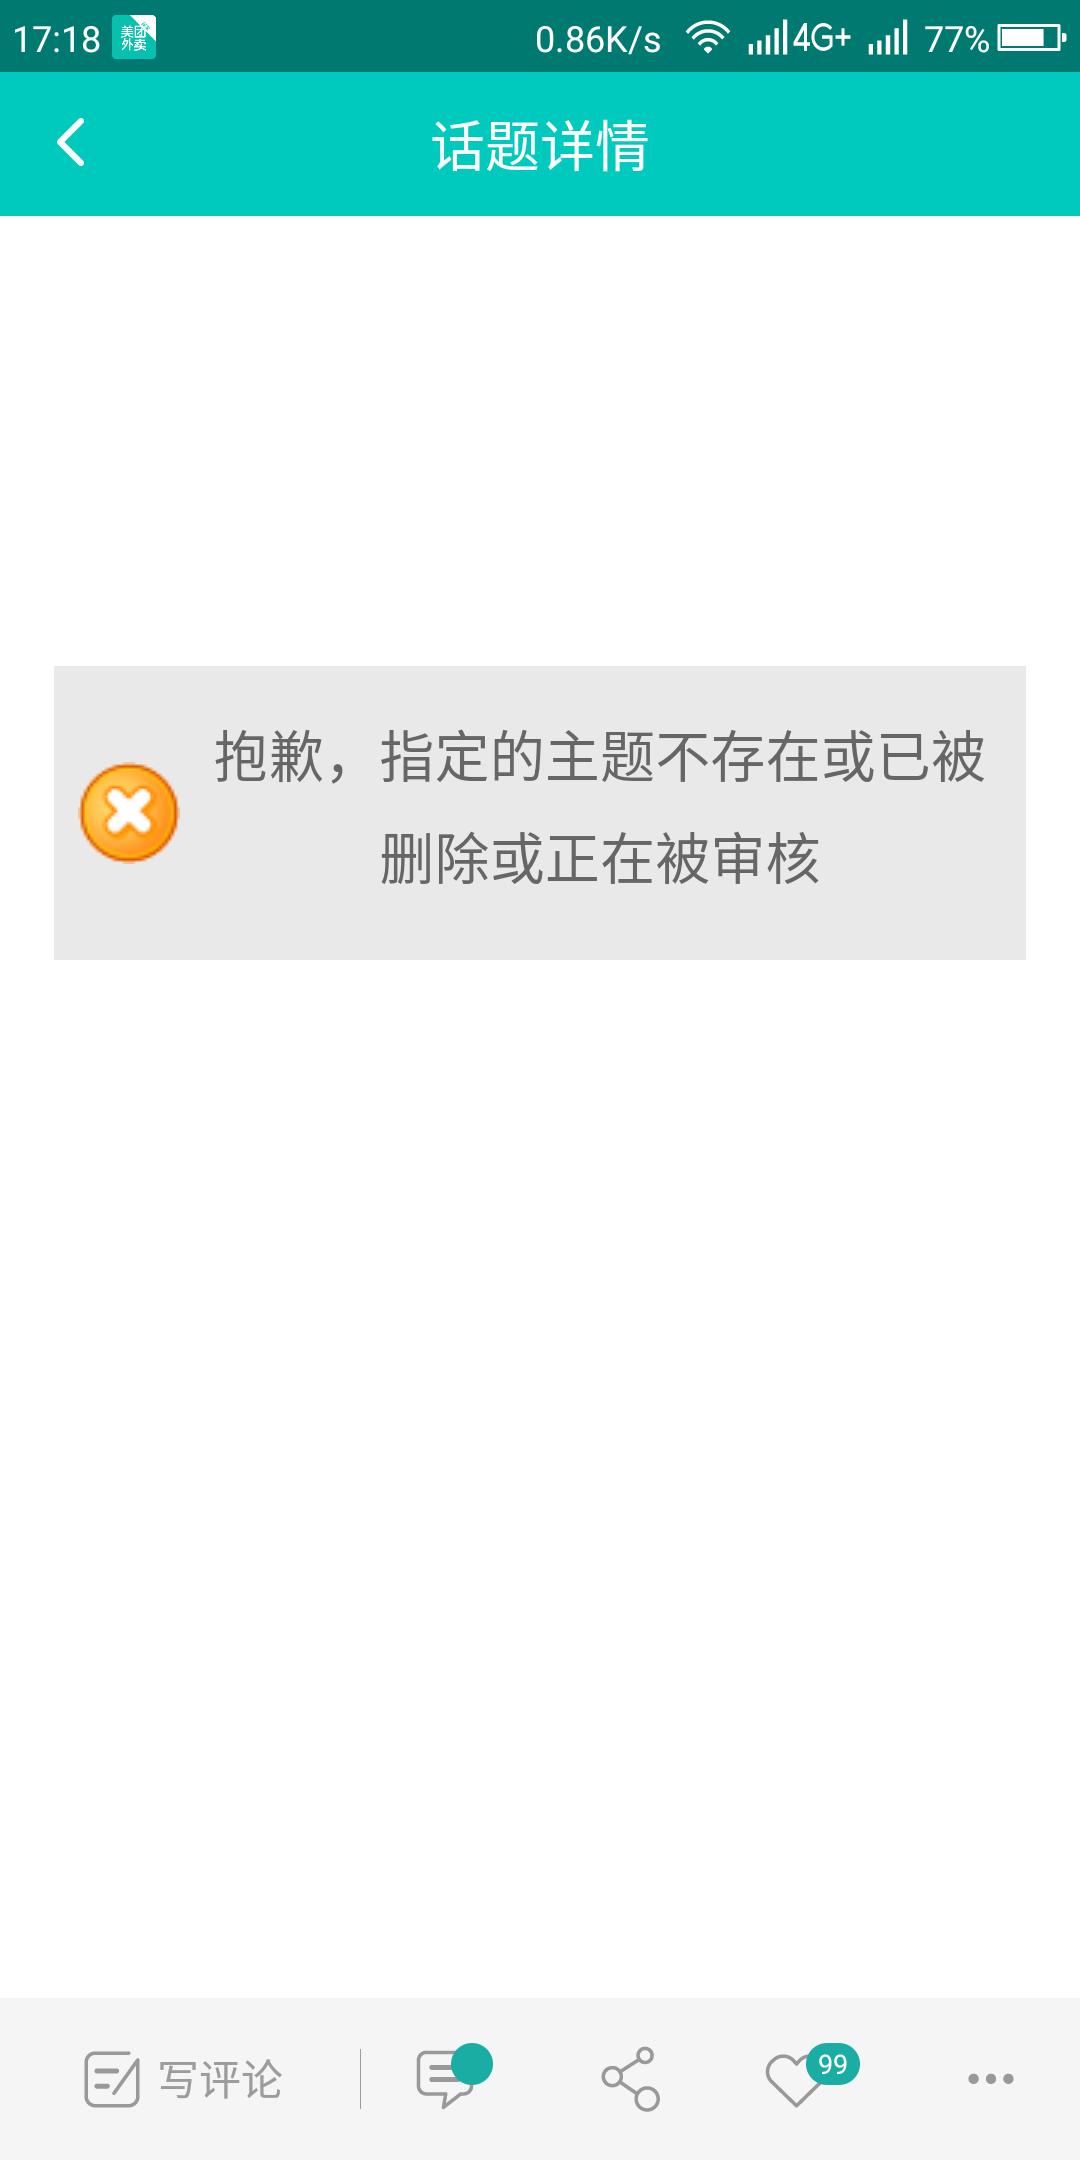 Screenshot_2018-09-03-17-18-44.png